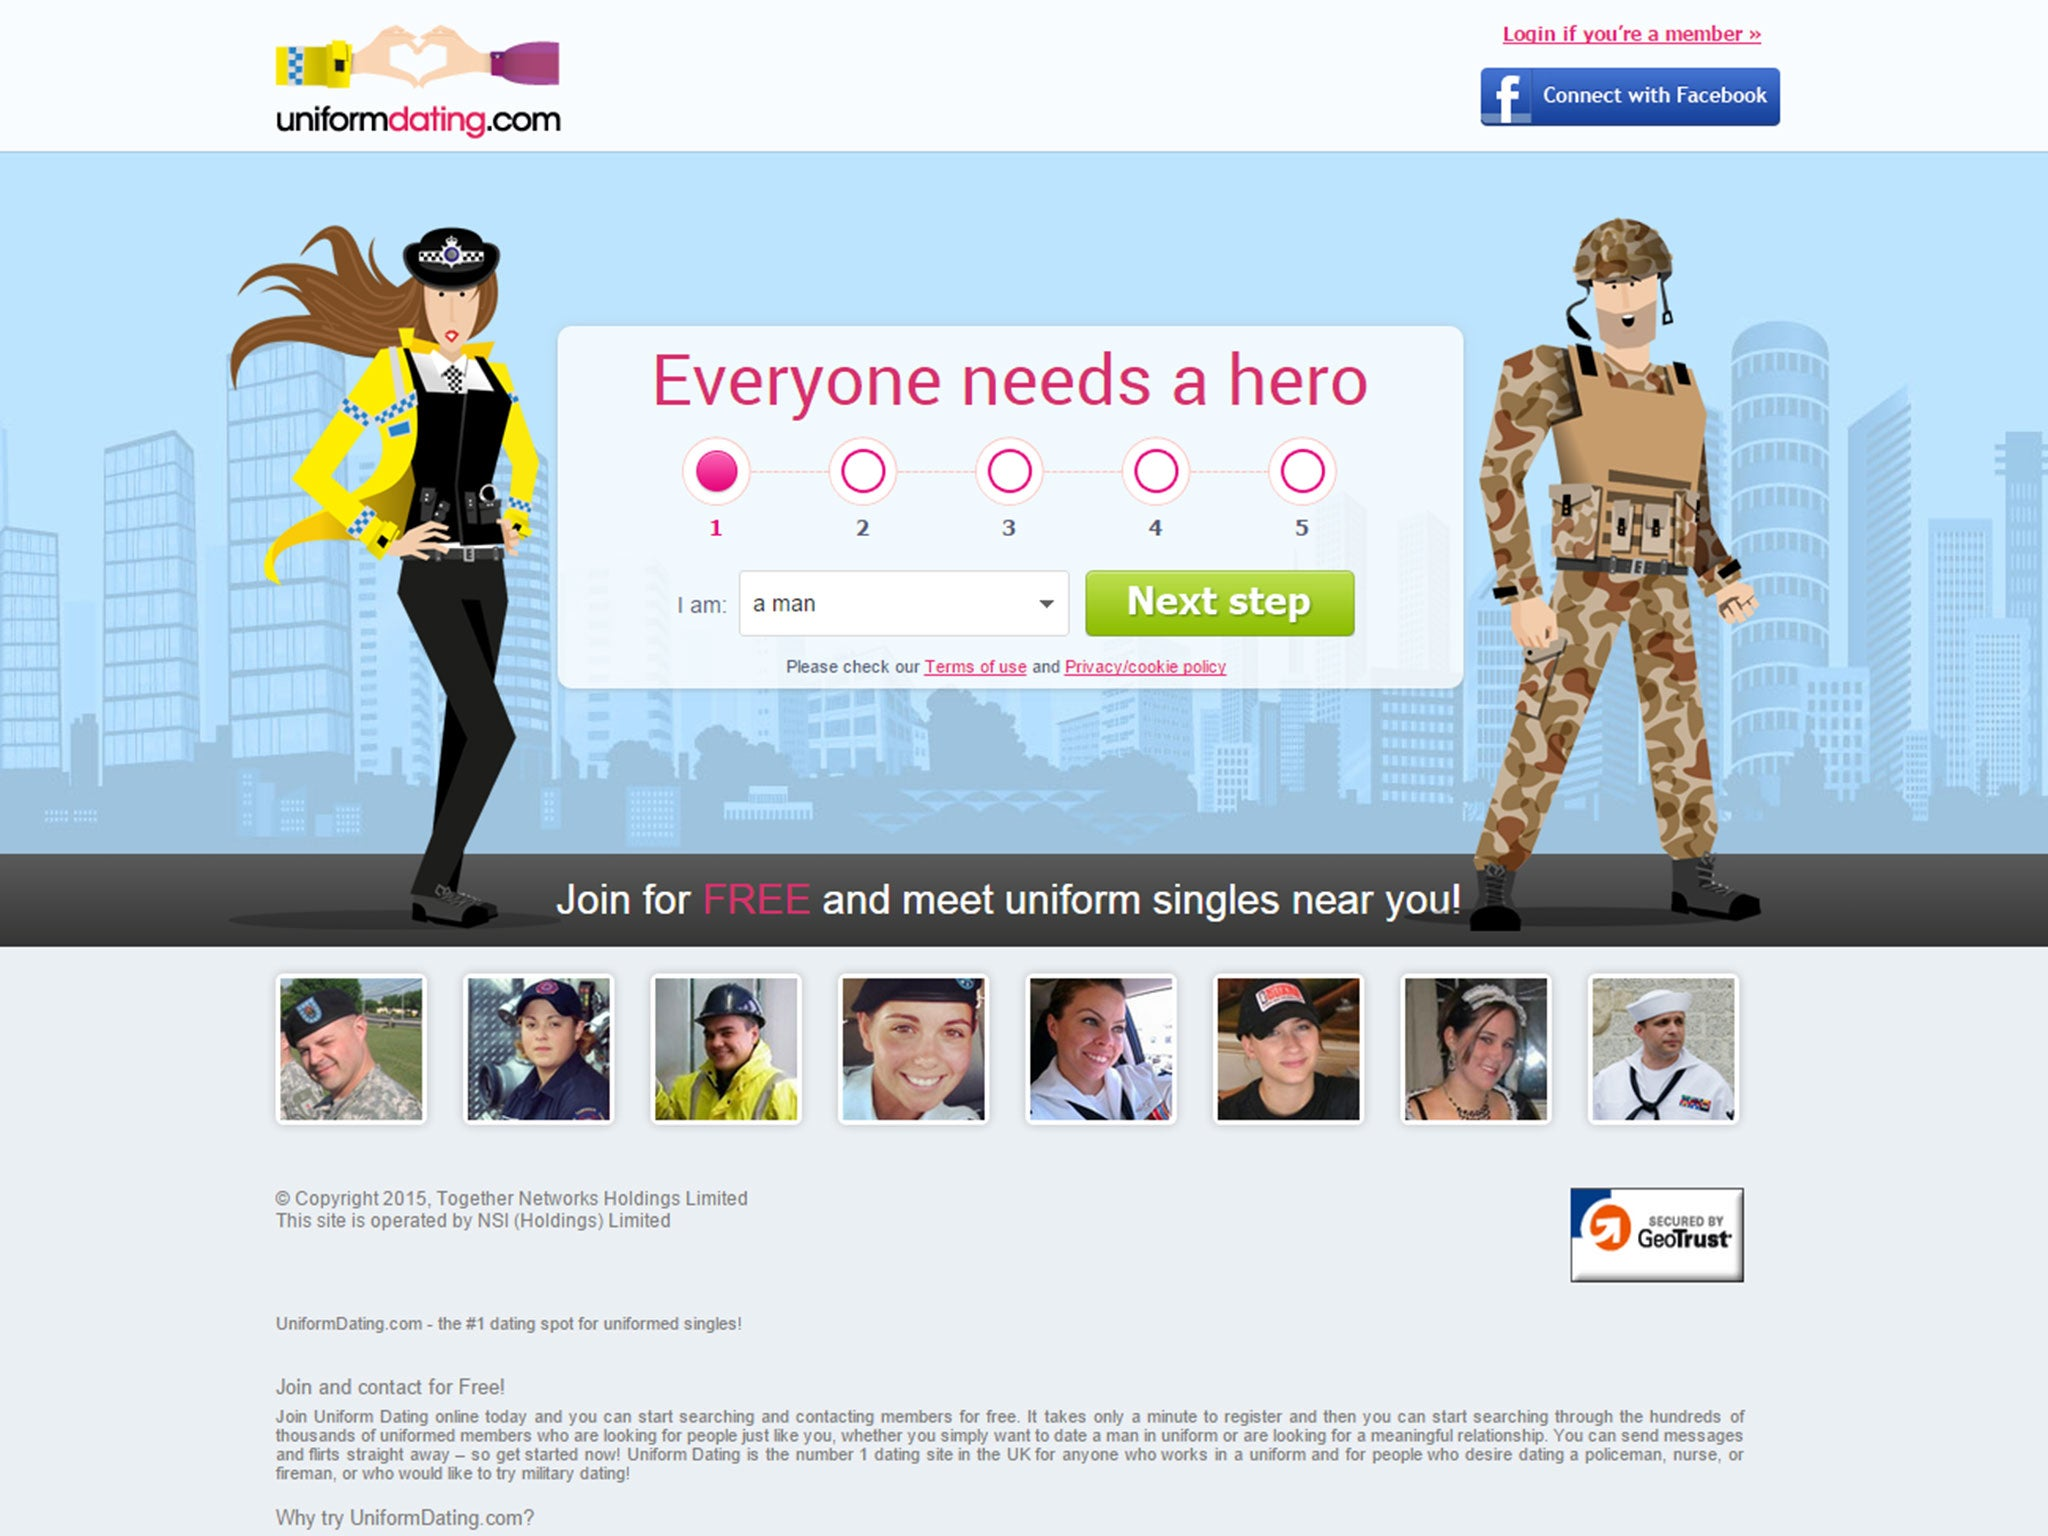 uniform dating voucher code 2014 dating site profiel foto tips